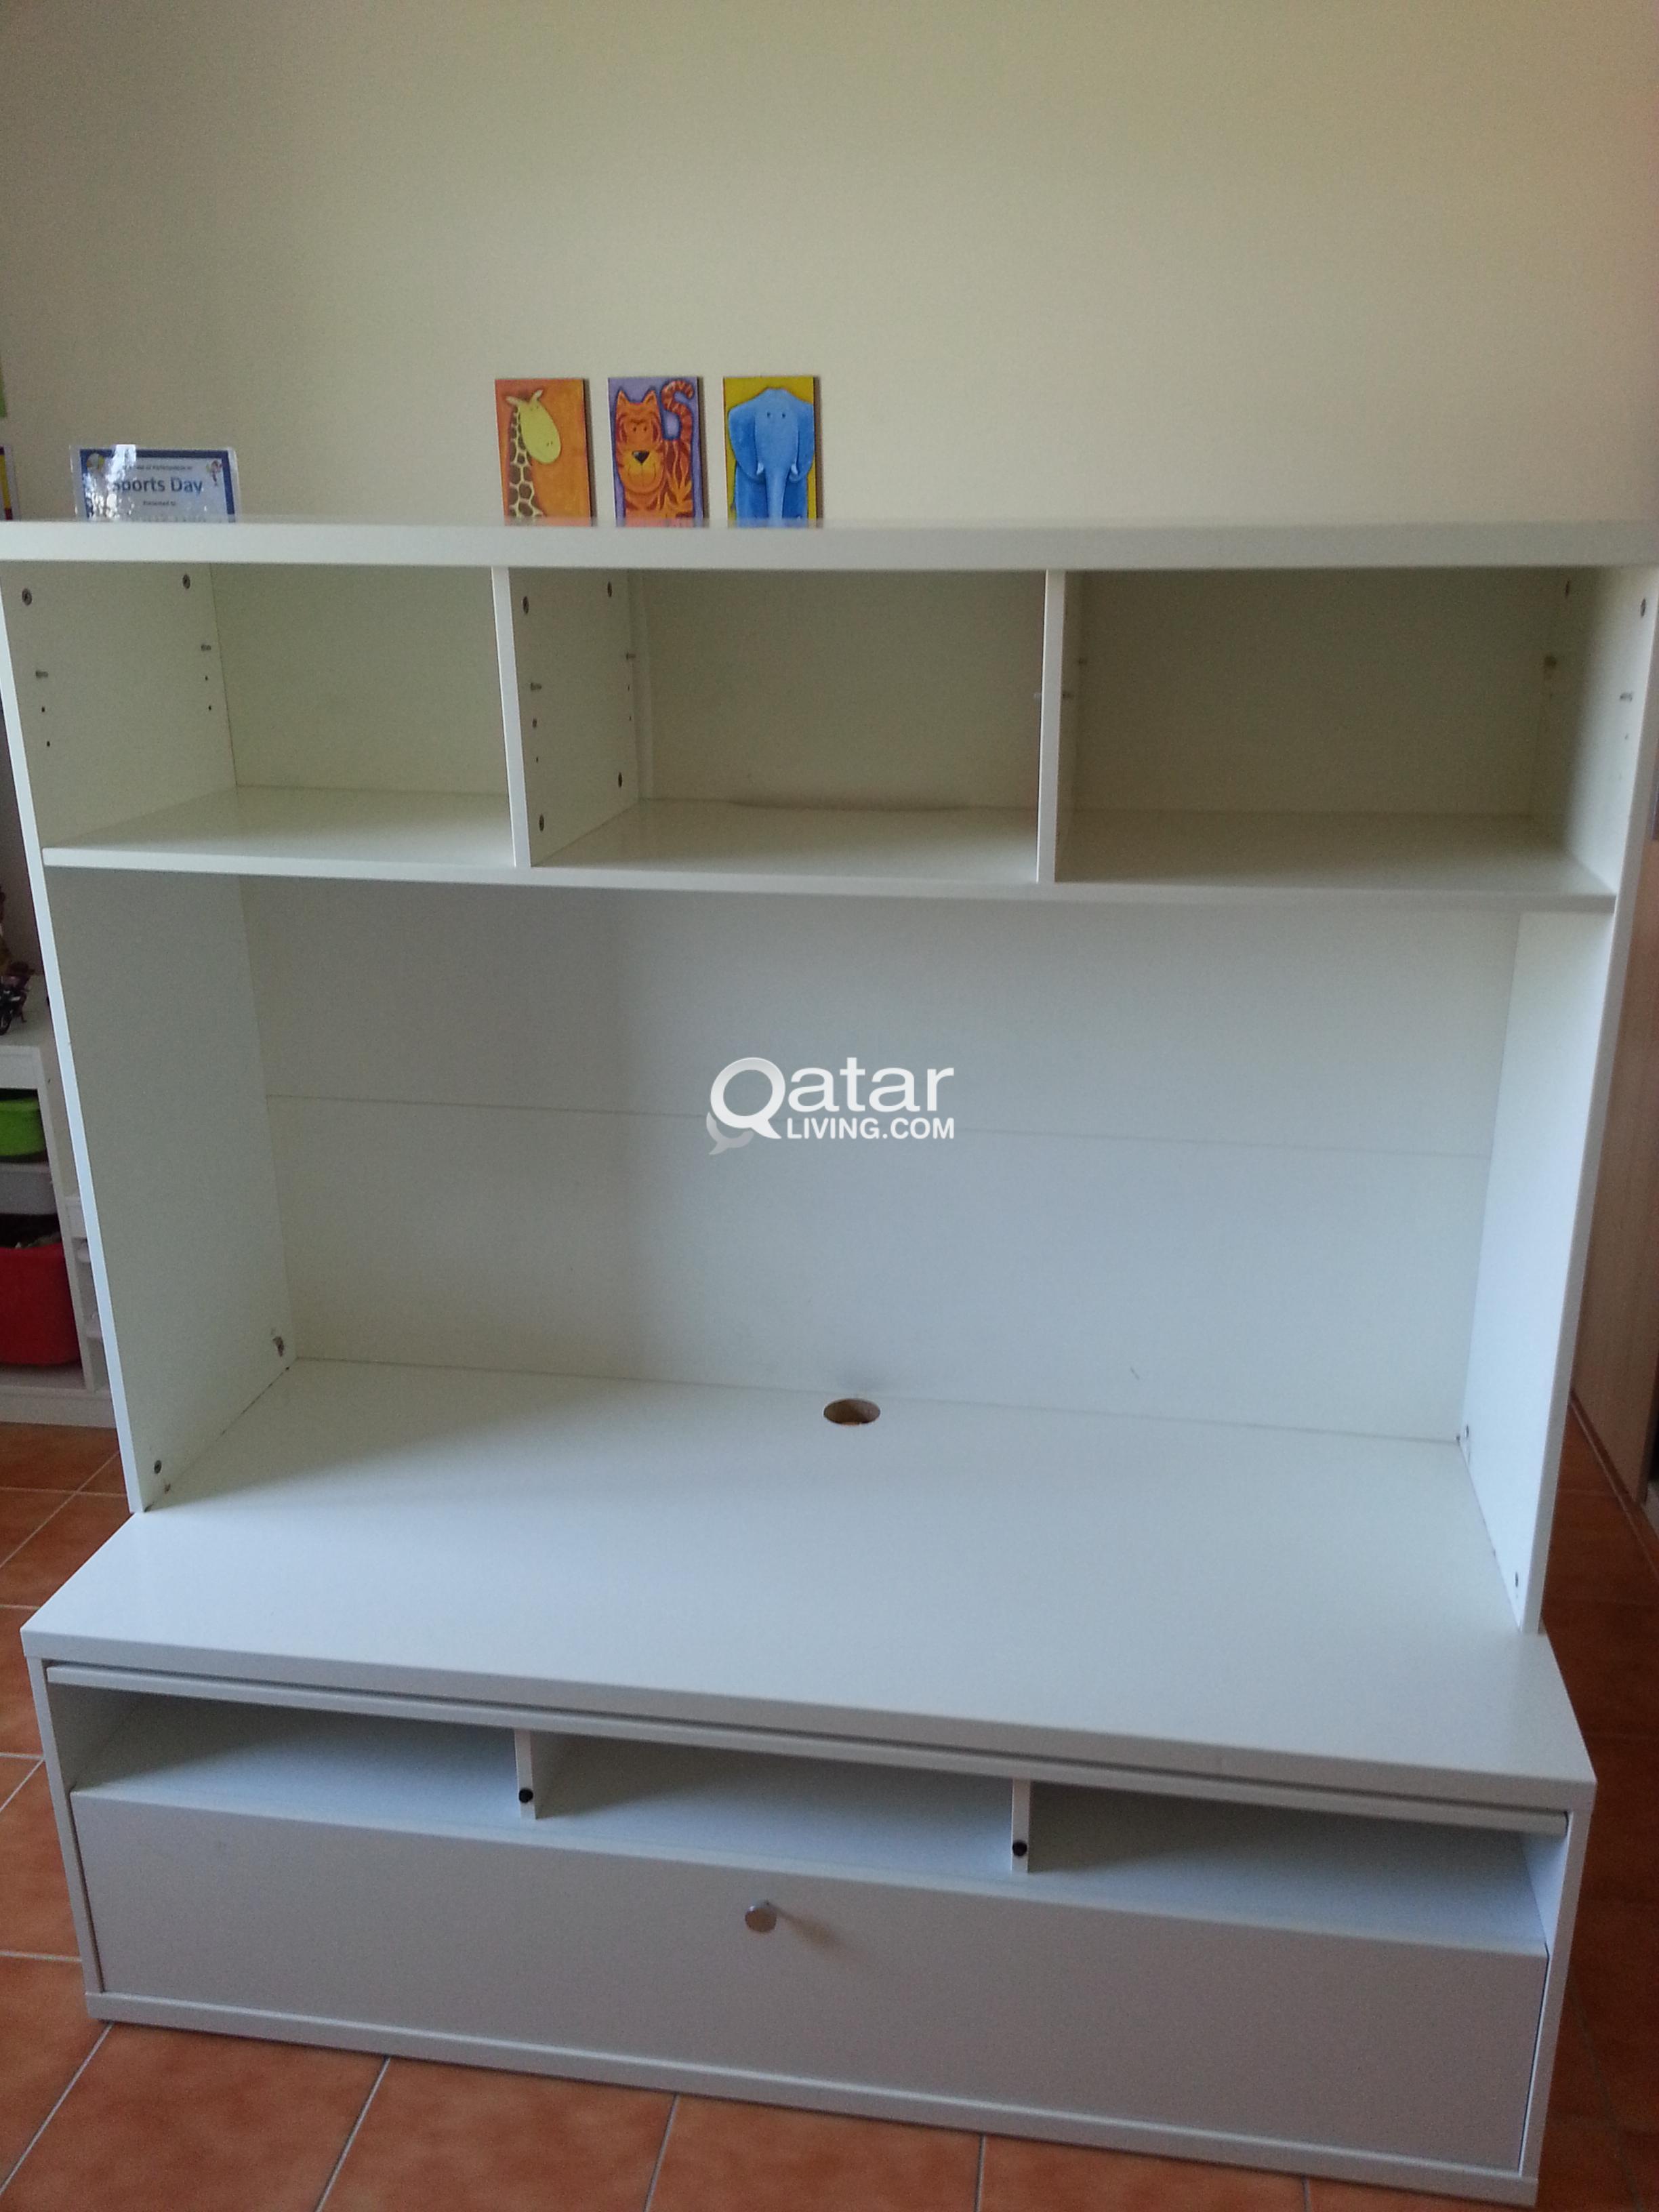 Ikea Bonde Tv Bench Qatar Living # Meuble Tele Bonde Ikea